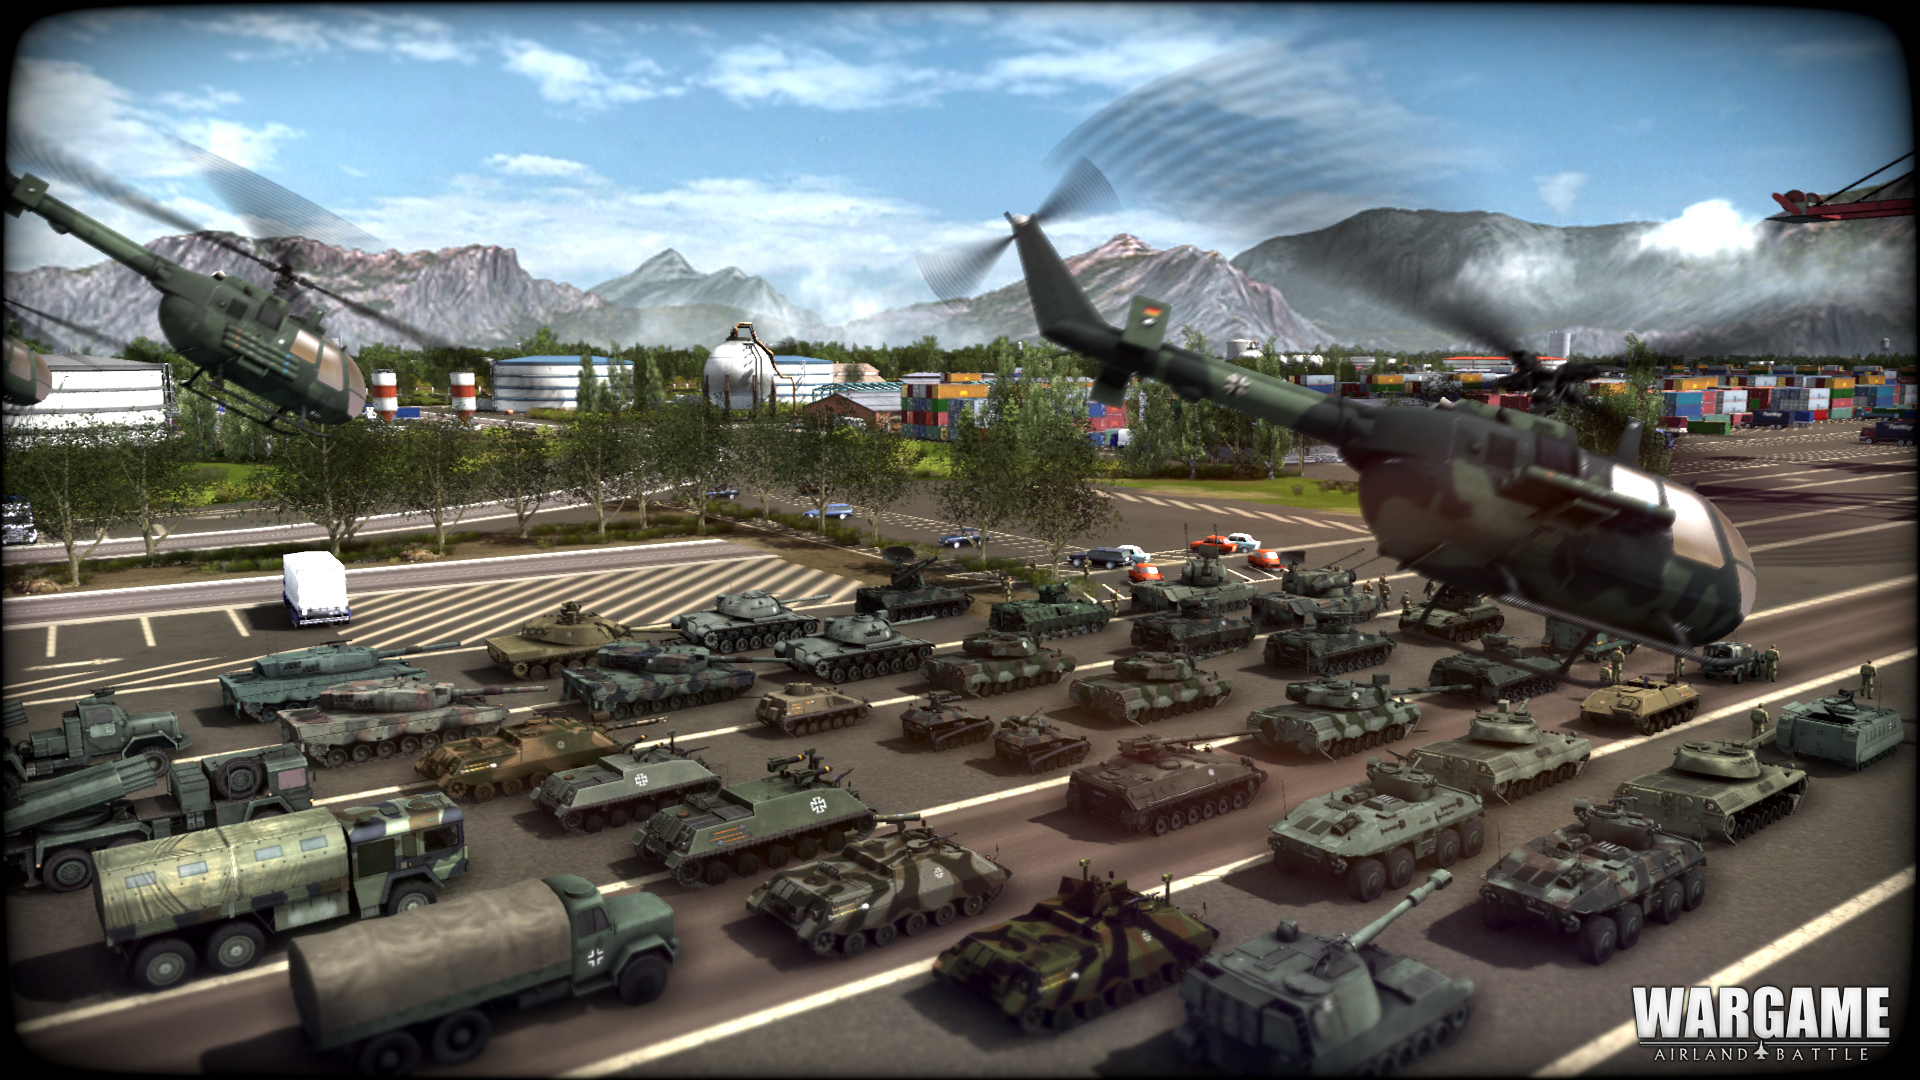 german units roll into wargame airland battle brutal gamer